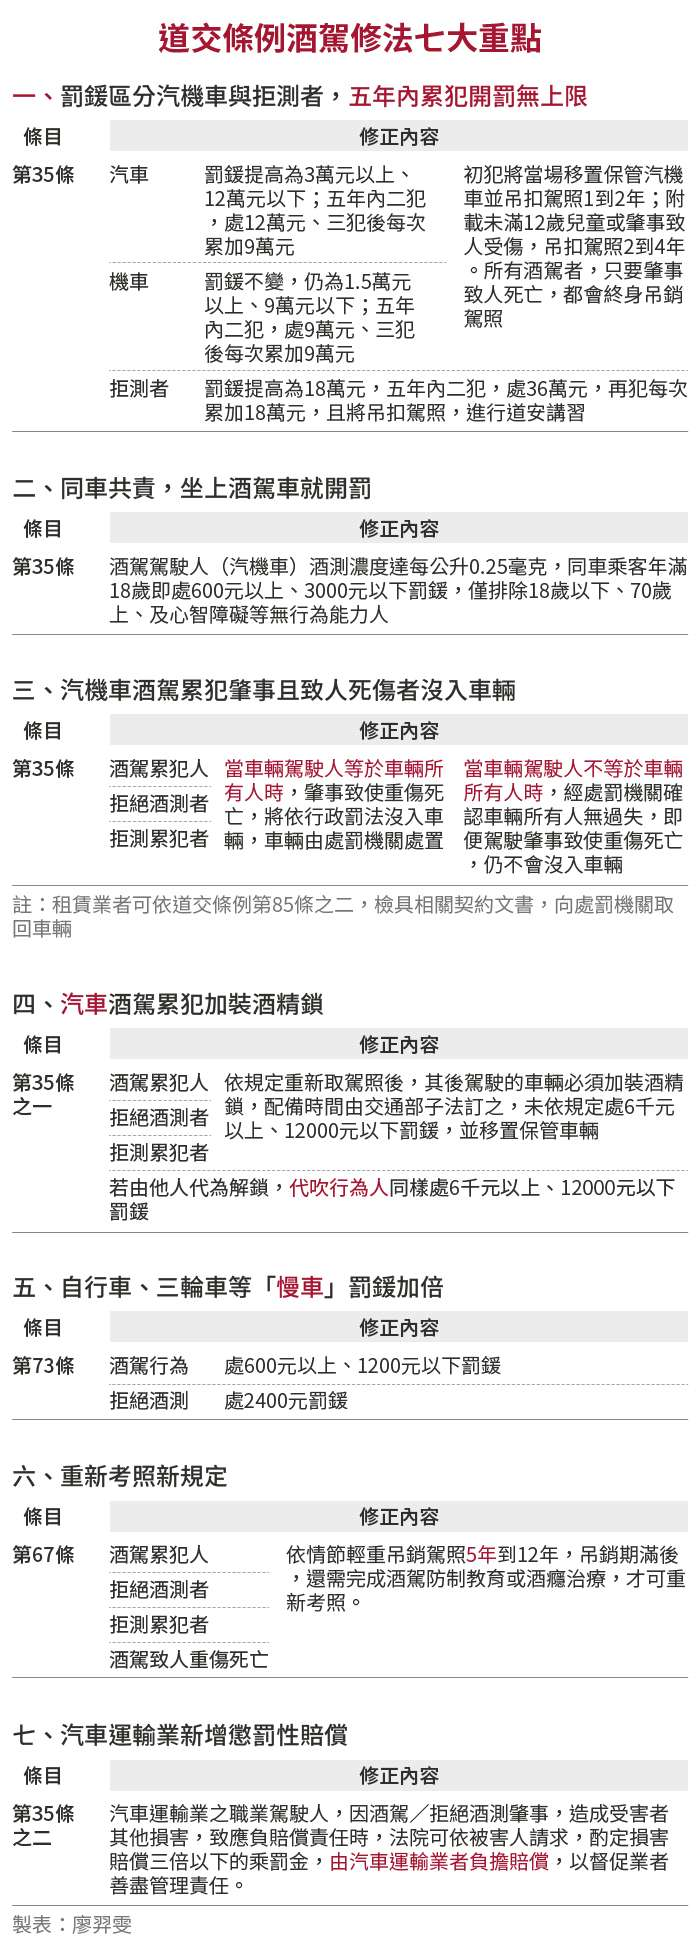 20190326-SMG0034-E01-道交條例酒駕修法七大重點